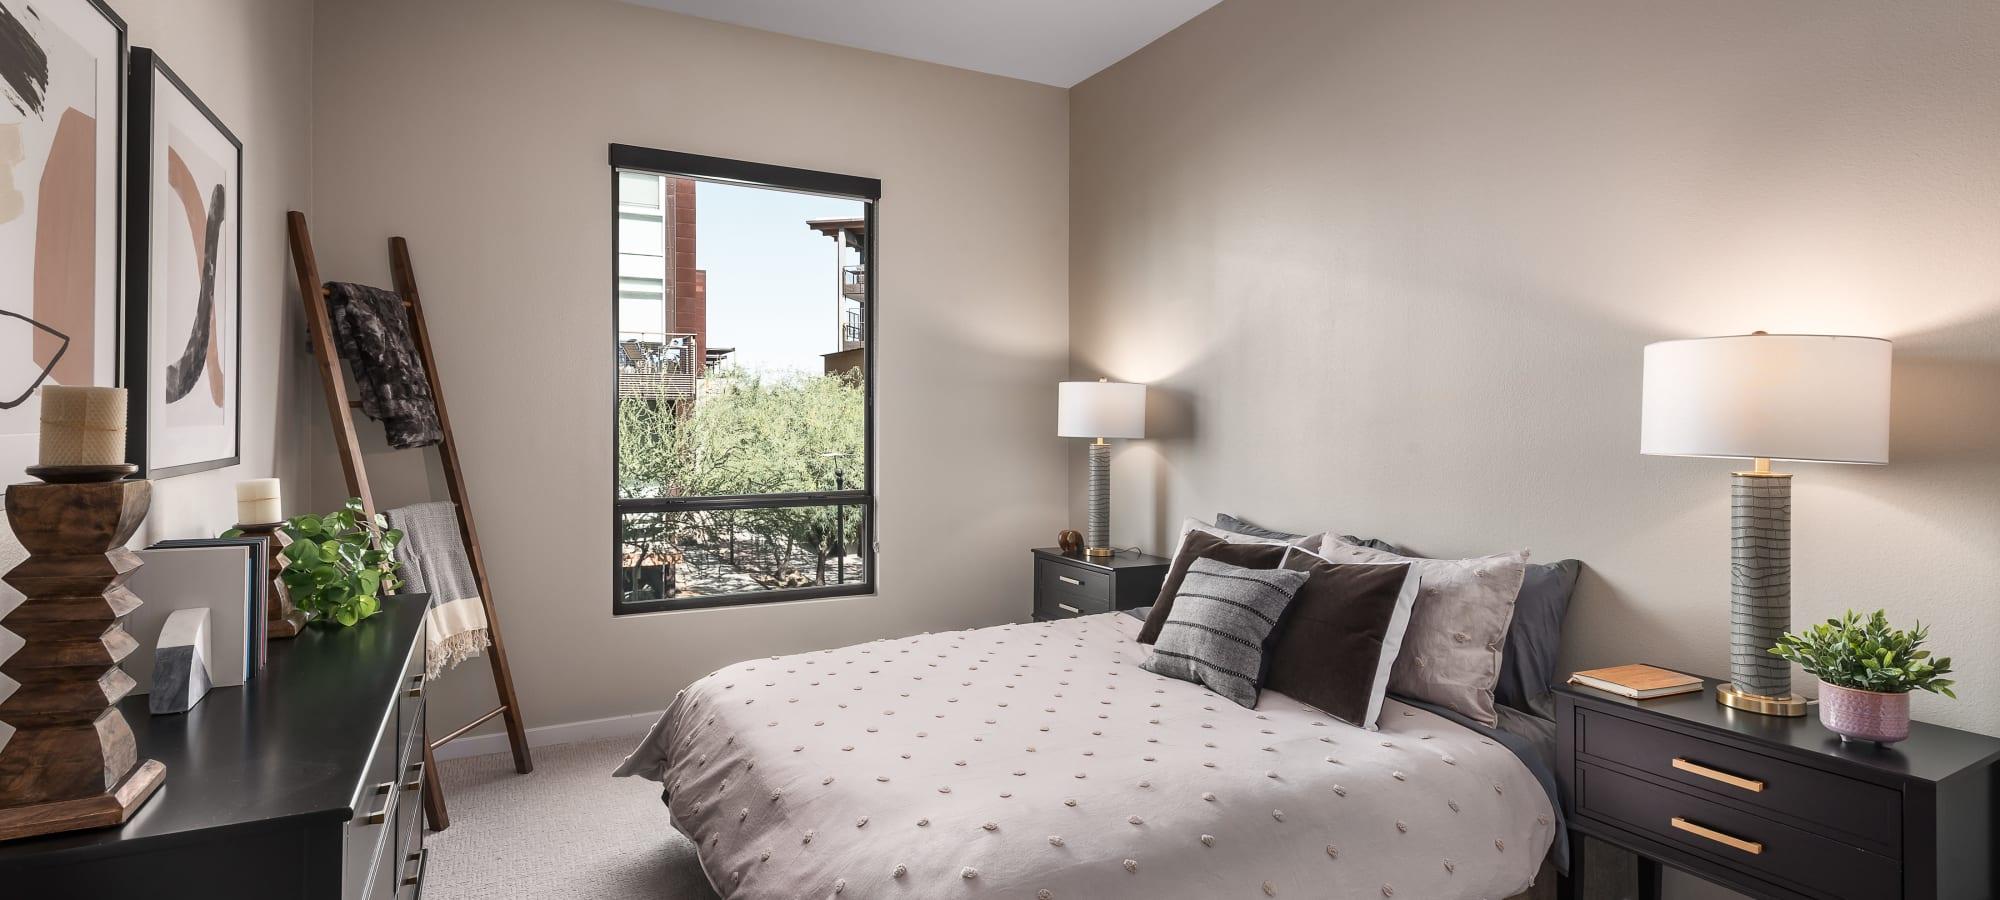 Modern second bedroom at Gramercy Scottsdale in Scottsdale, Arizona